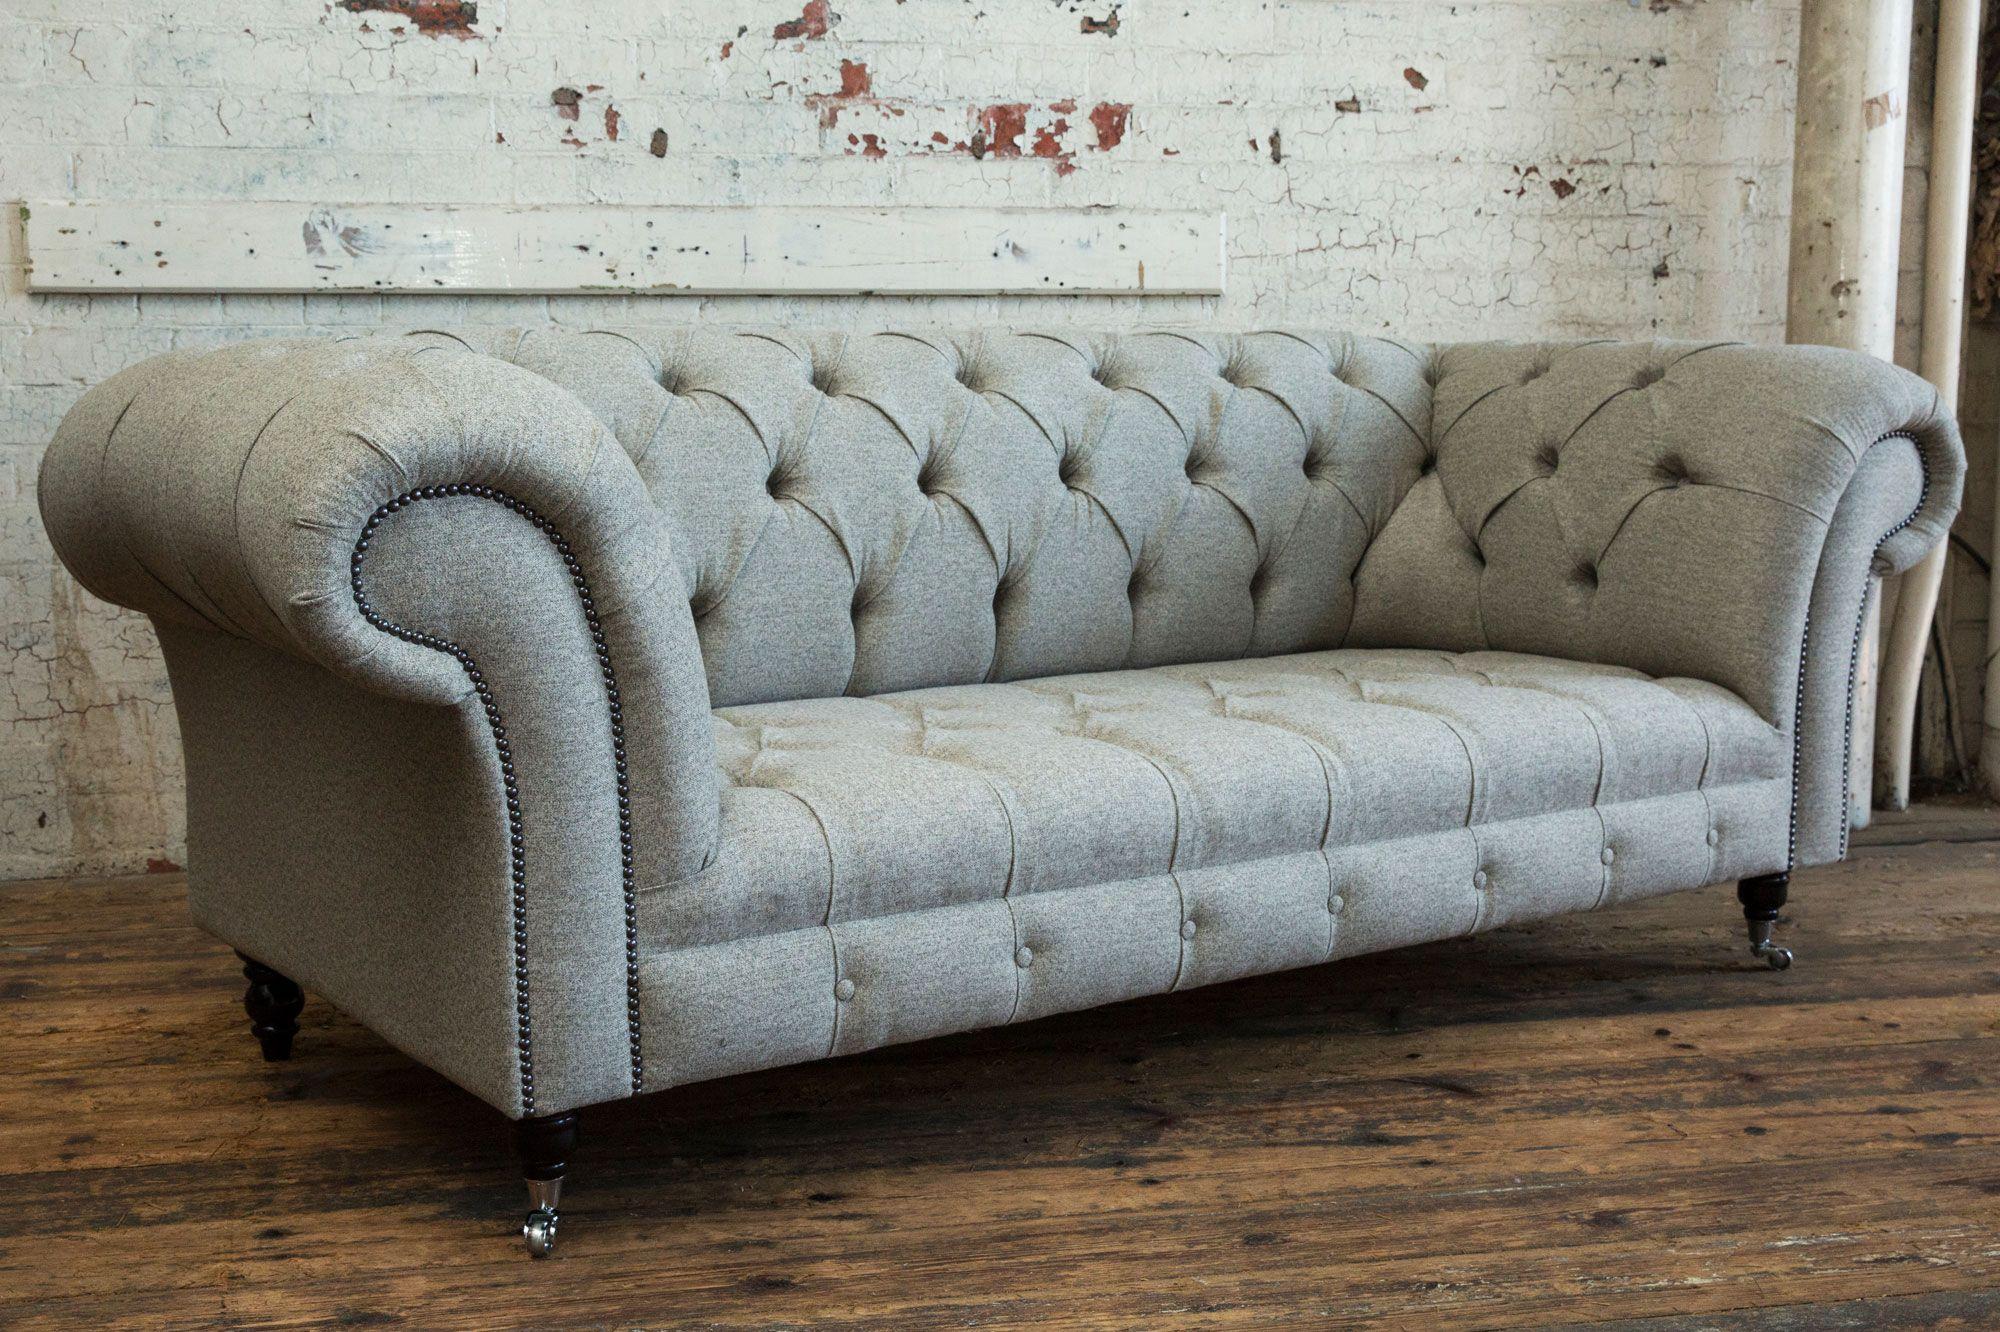 Romford Chesterfield Sofa In 2020 | Chesterfield Sofa, Sofa, Chesterfield